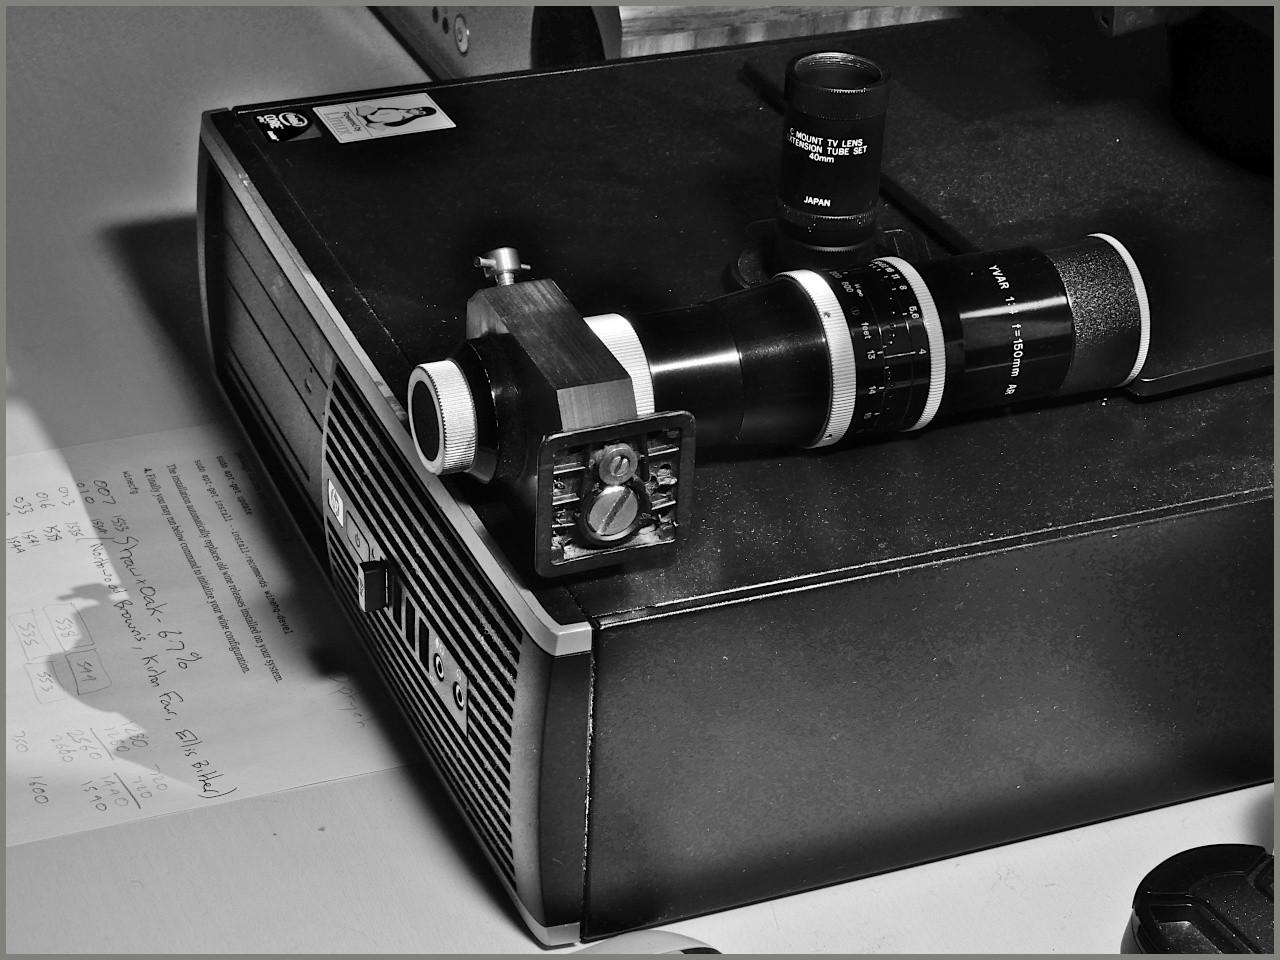 200515-P1100074-55mm-mono-web.JPG